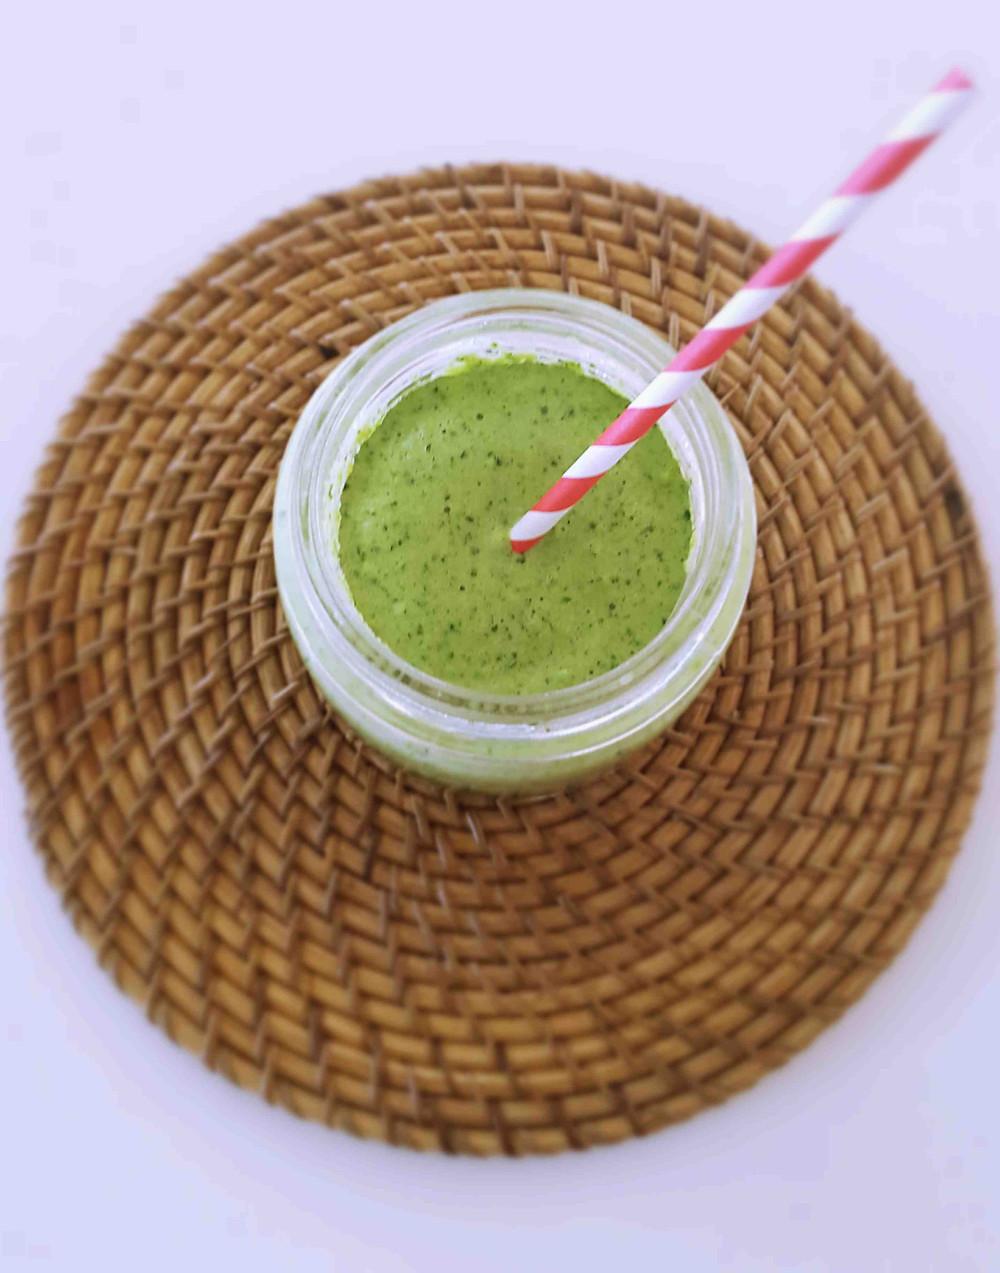 Green juice_Fotor.jpg